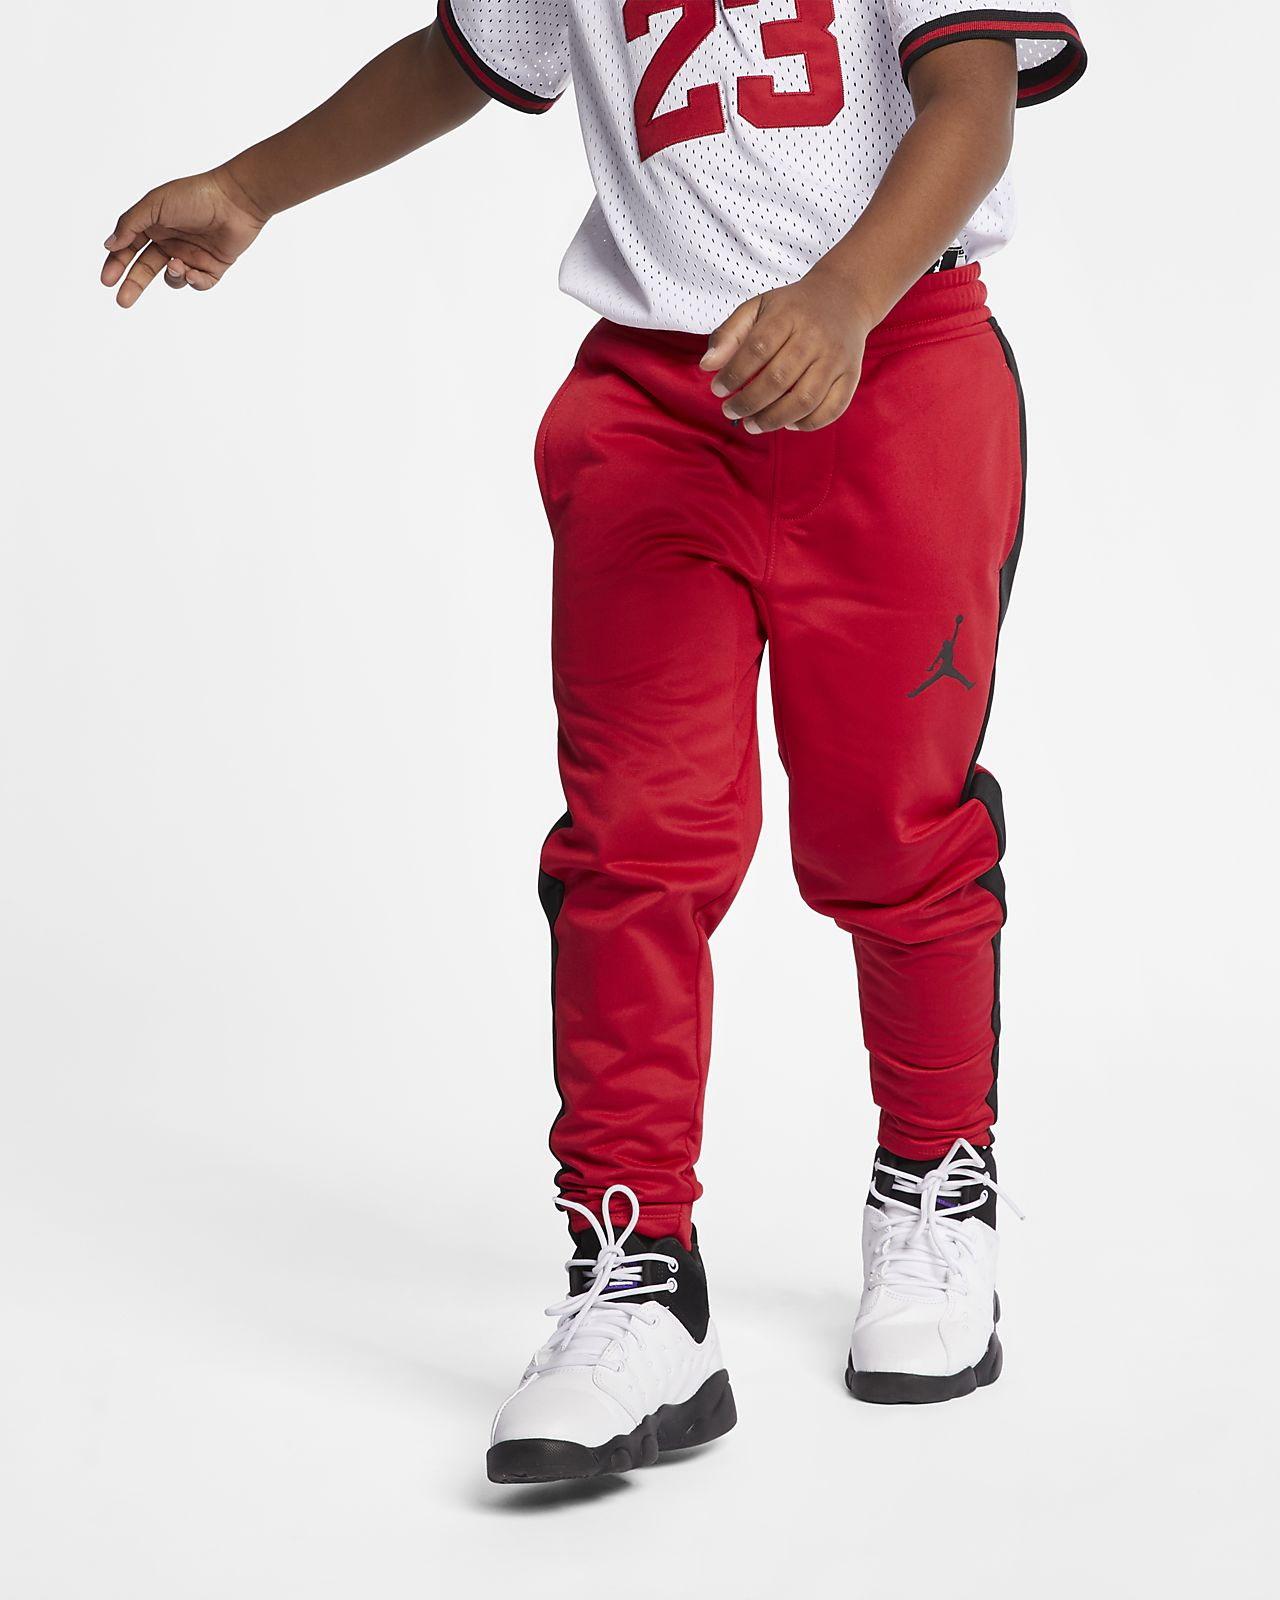 Jordan Sportswear Diamond Pantalón - Niño/a pequeño/a